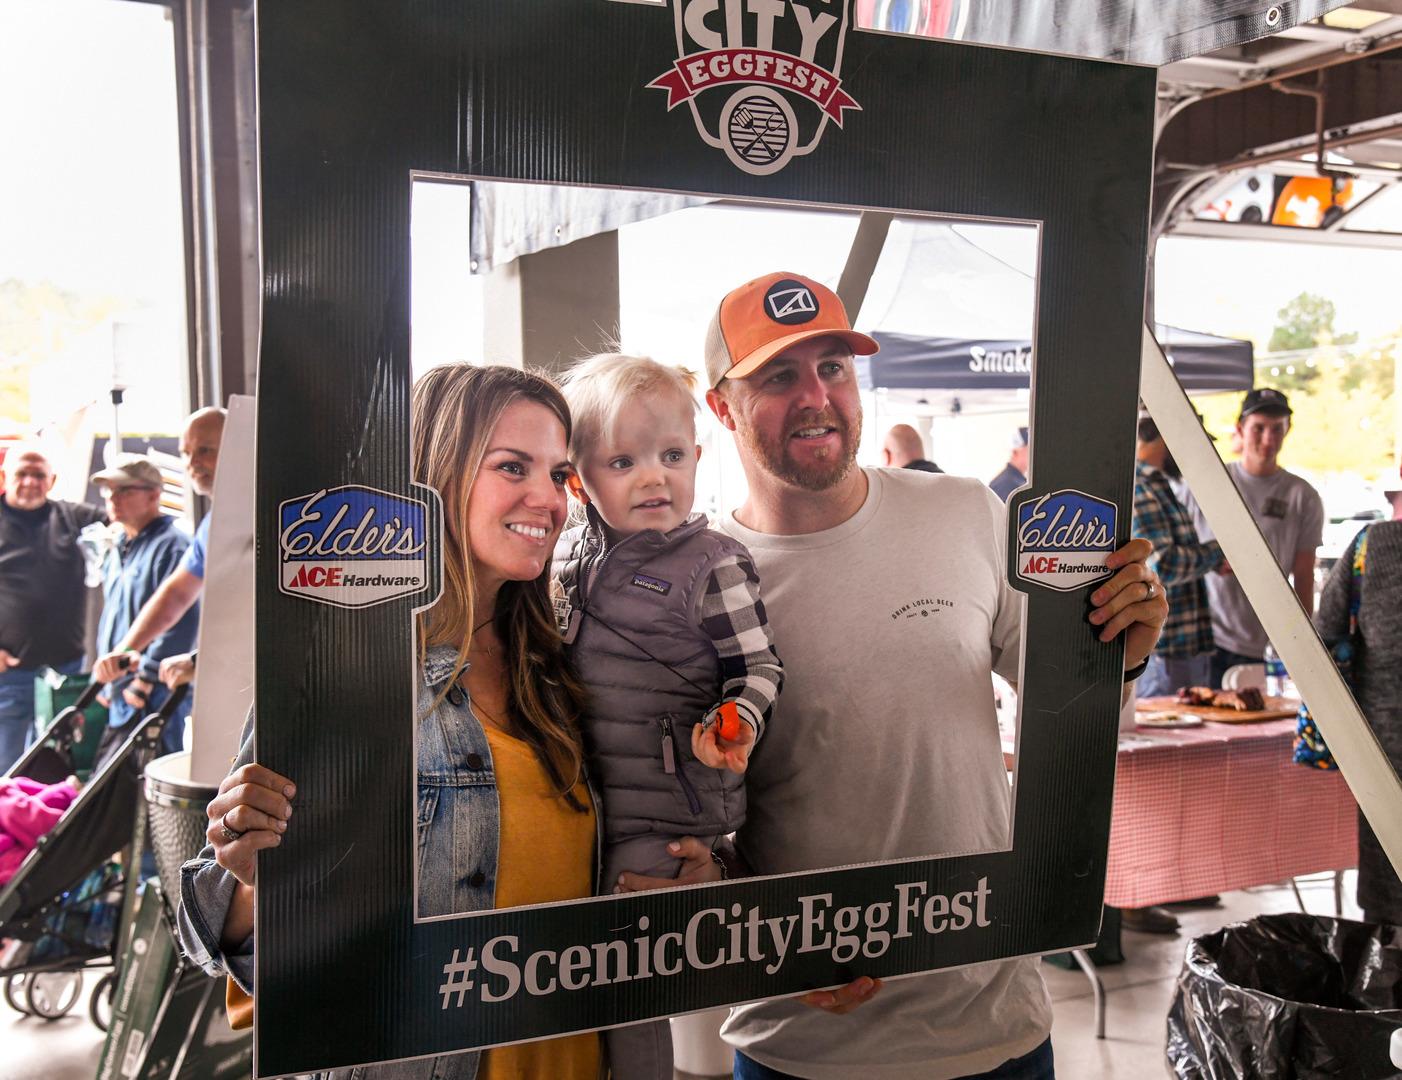 Scenic City Eggfest